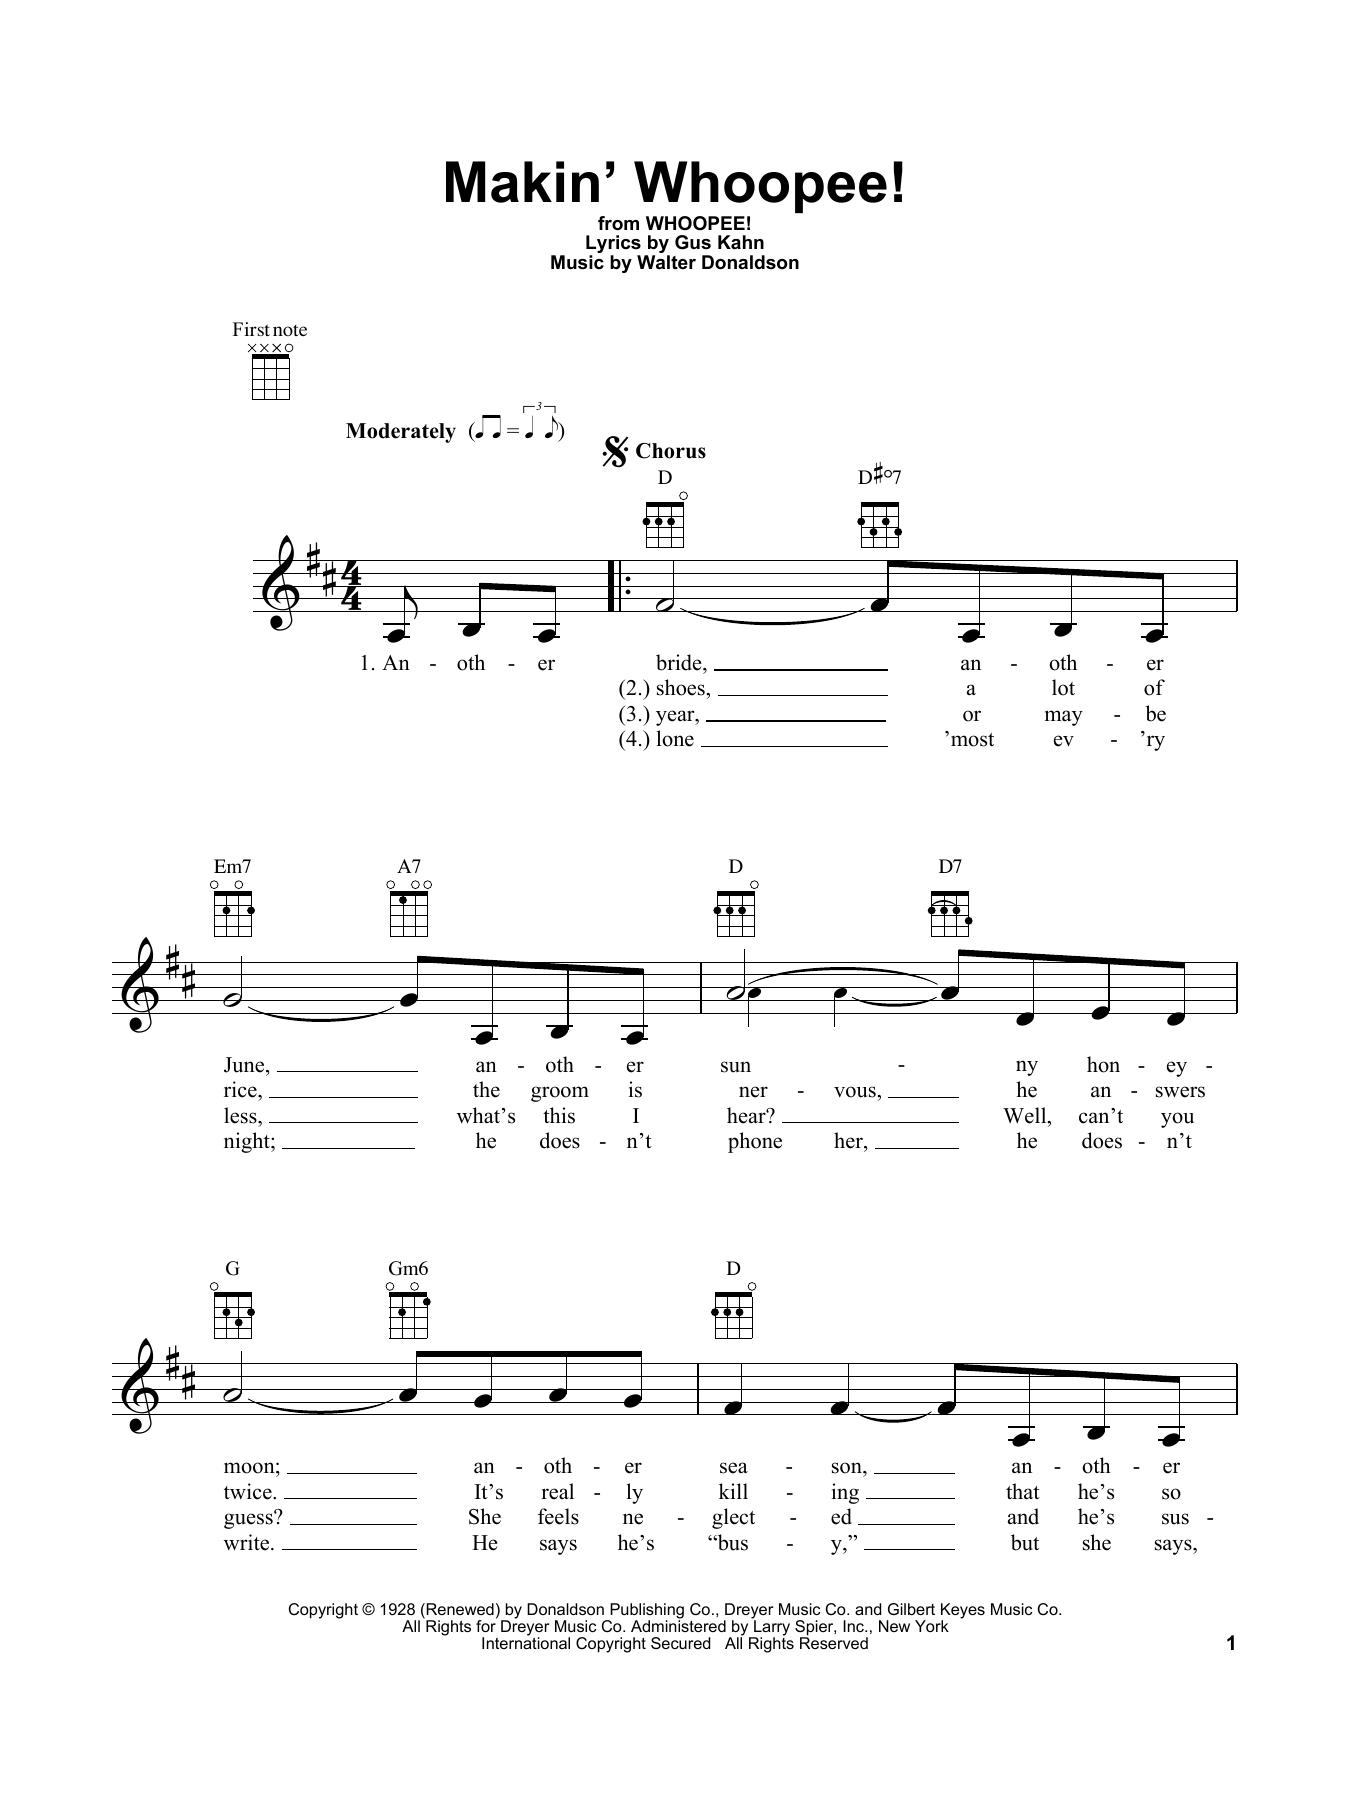 John Hicks Makin' Whoopee! sheet music notes and chords. Download Printable PDF.